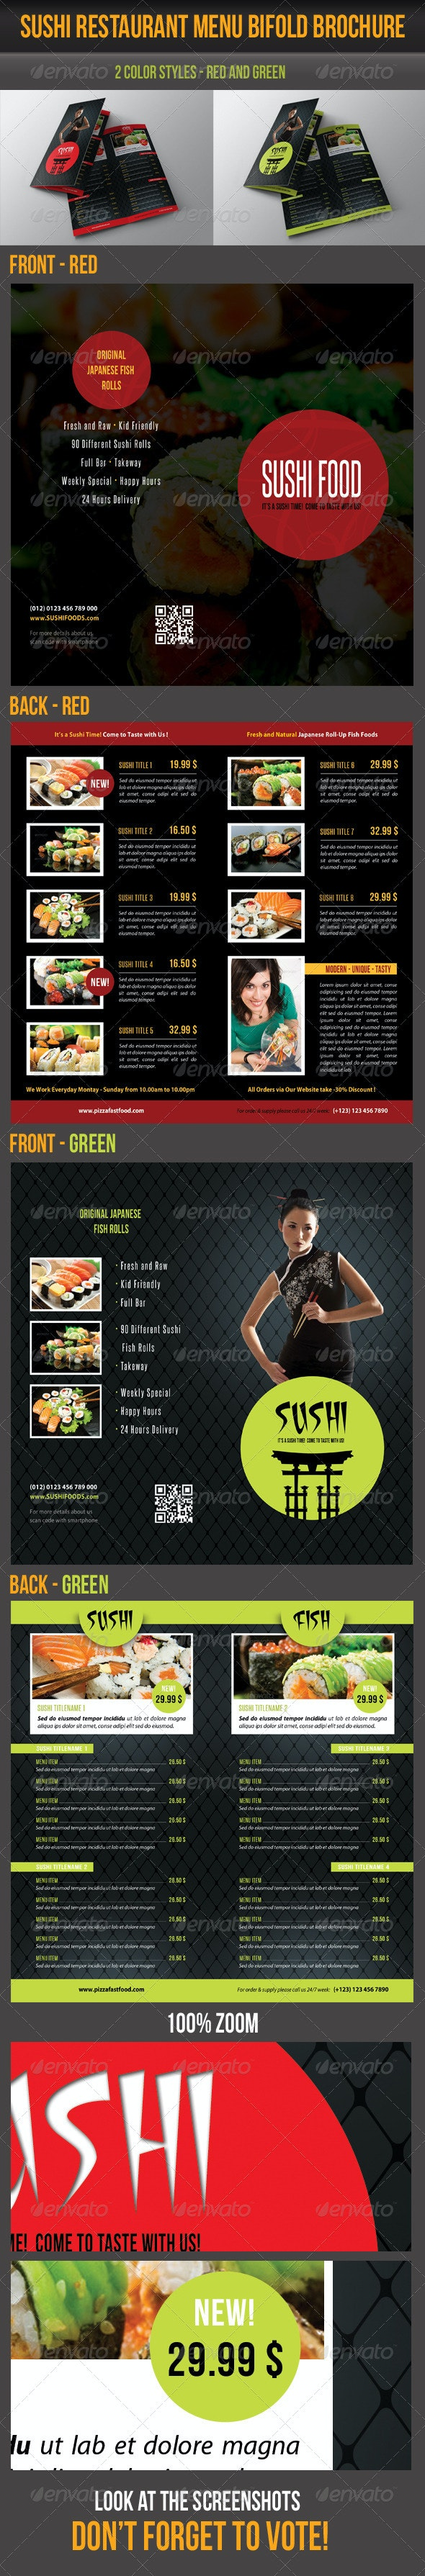 Multiuse Bifold Brochure 65 - Food Menus Print Templates